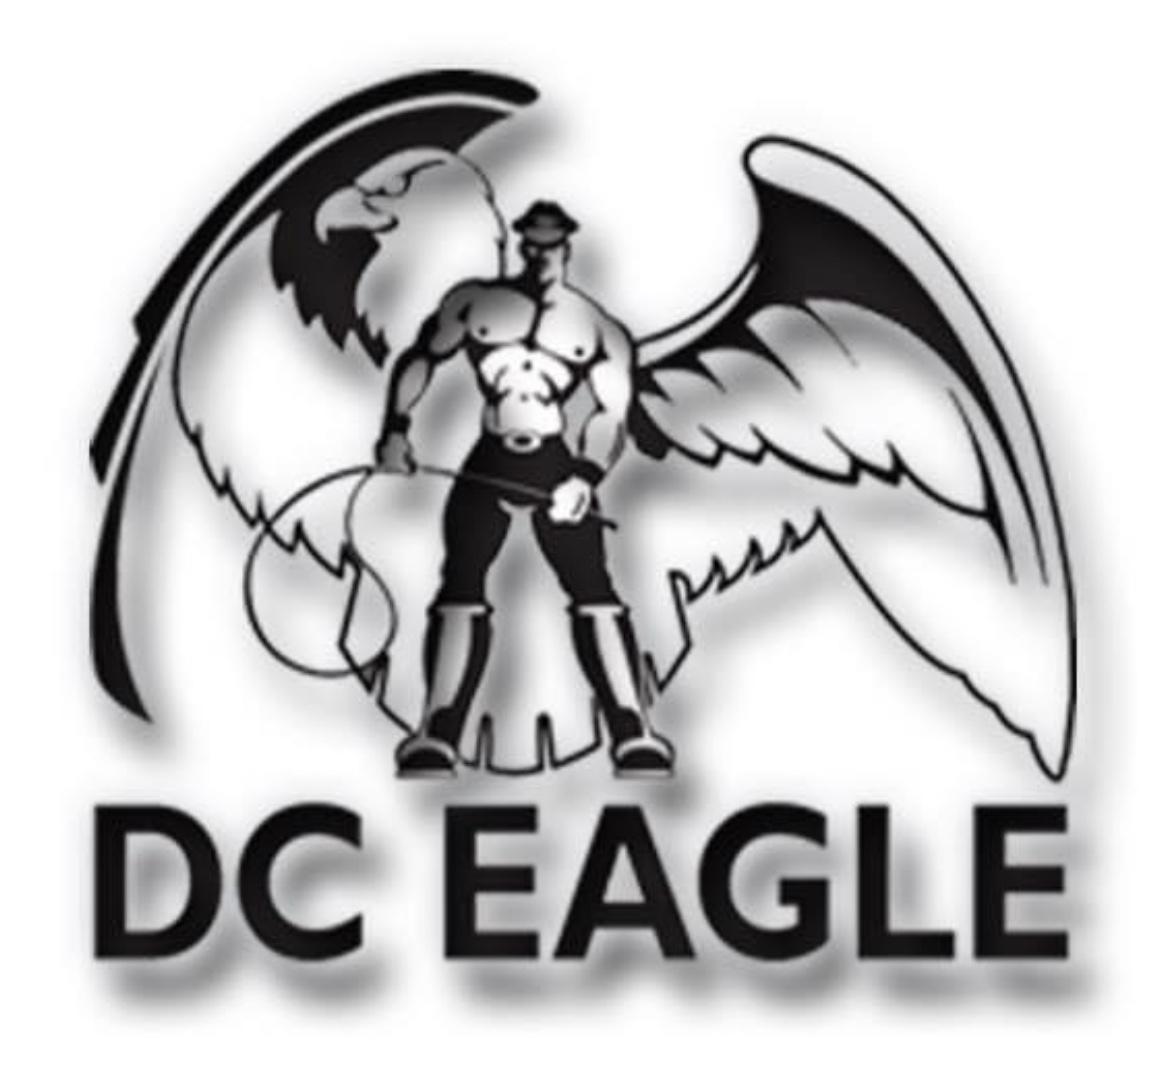 Mr DC Eagle 2020